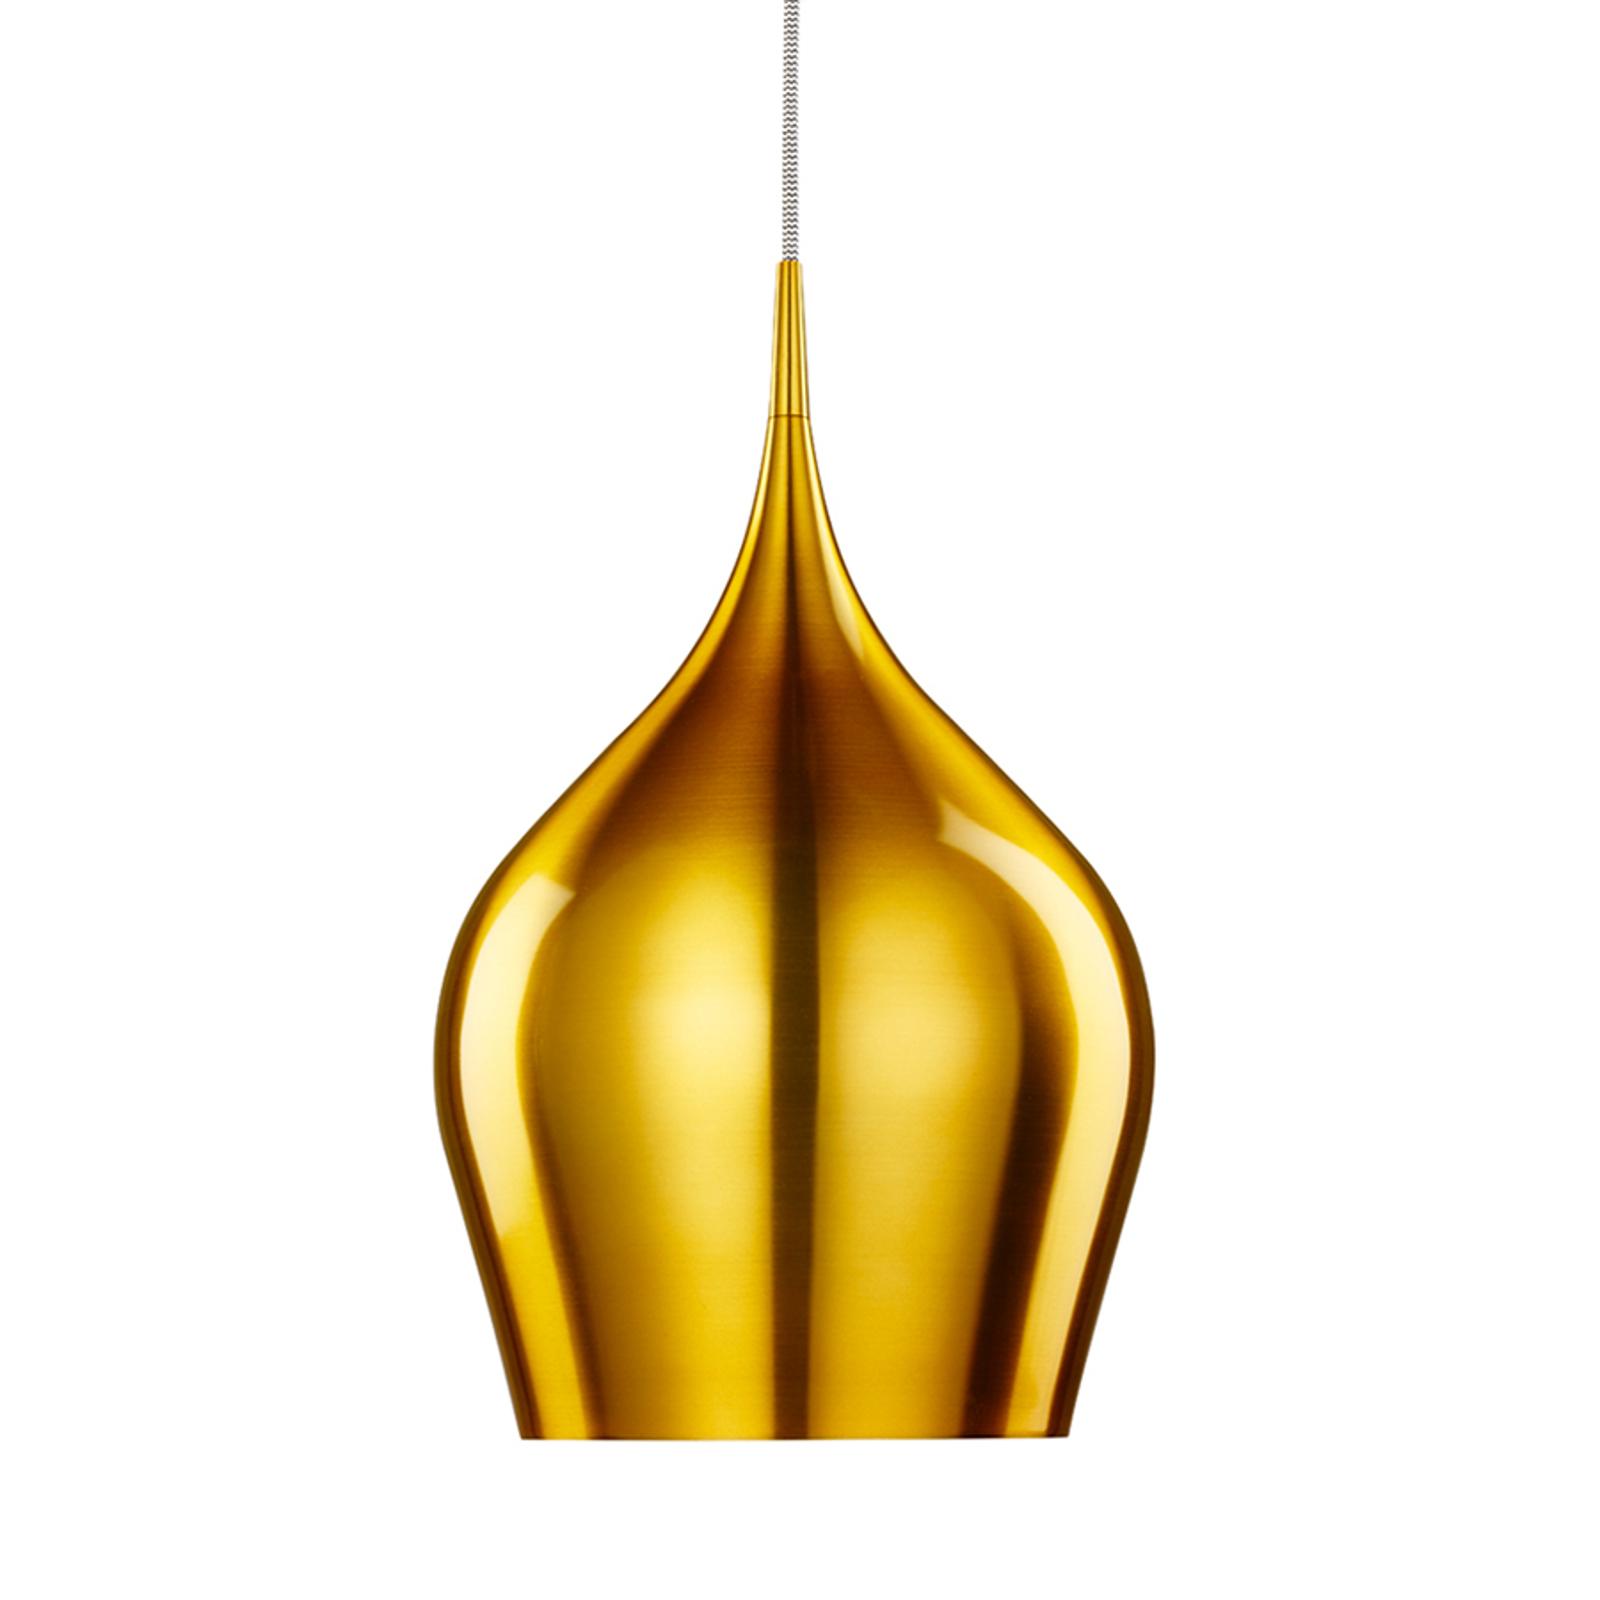 Suspension Vibrant scintillante couleur dorée